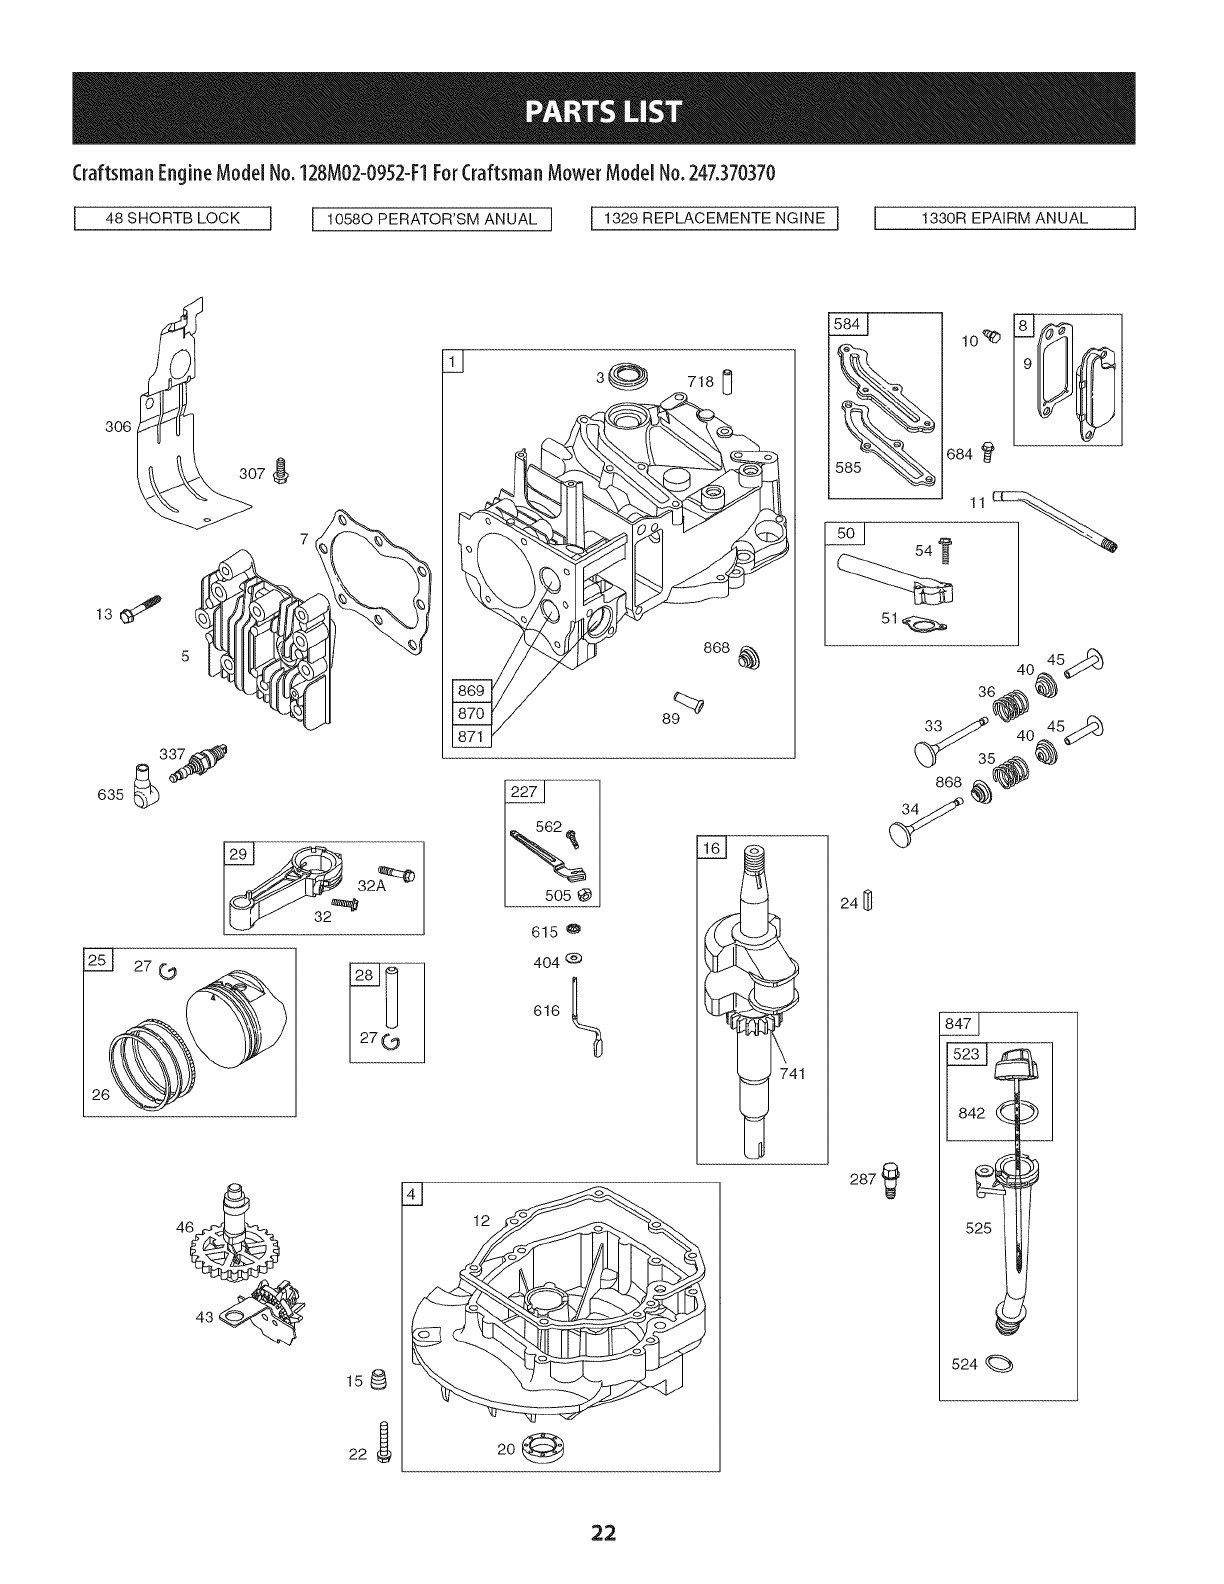 Craftsman 247370370 User Manual MOWER Manuals And Guides